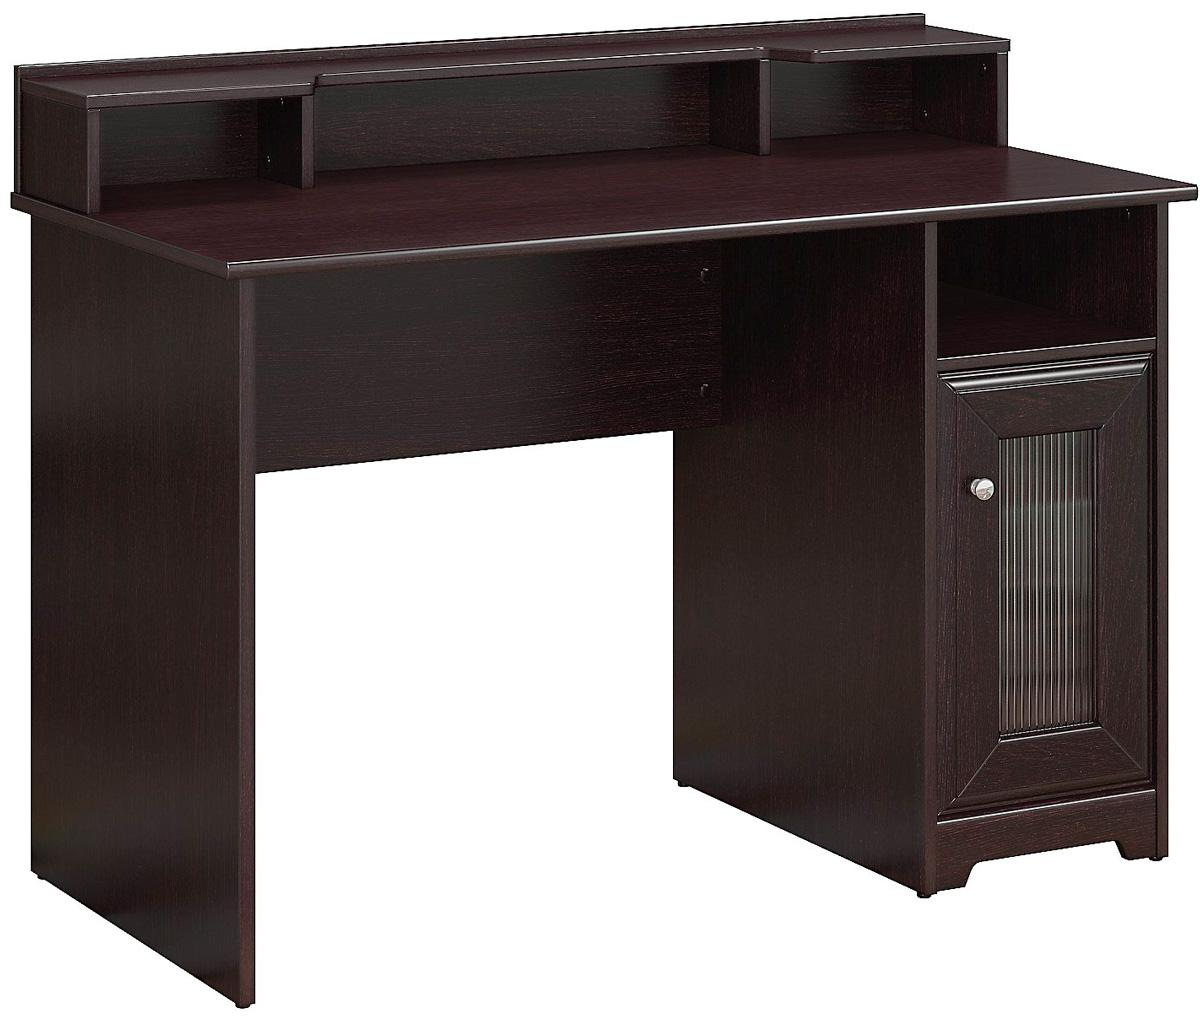 Bush Furniture Cabot Espresso Oak Single Pedestal Desk